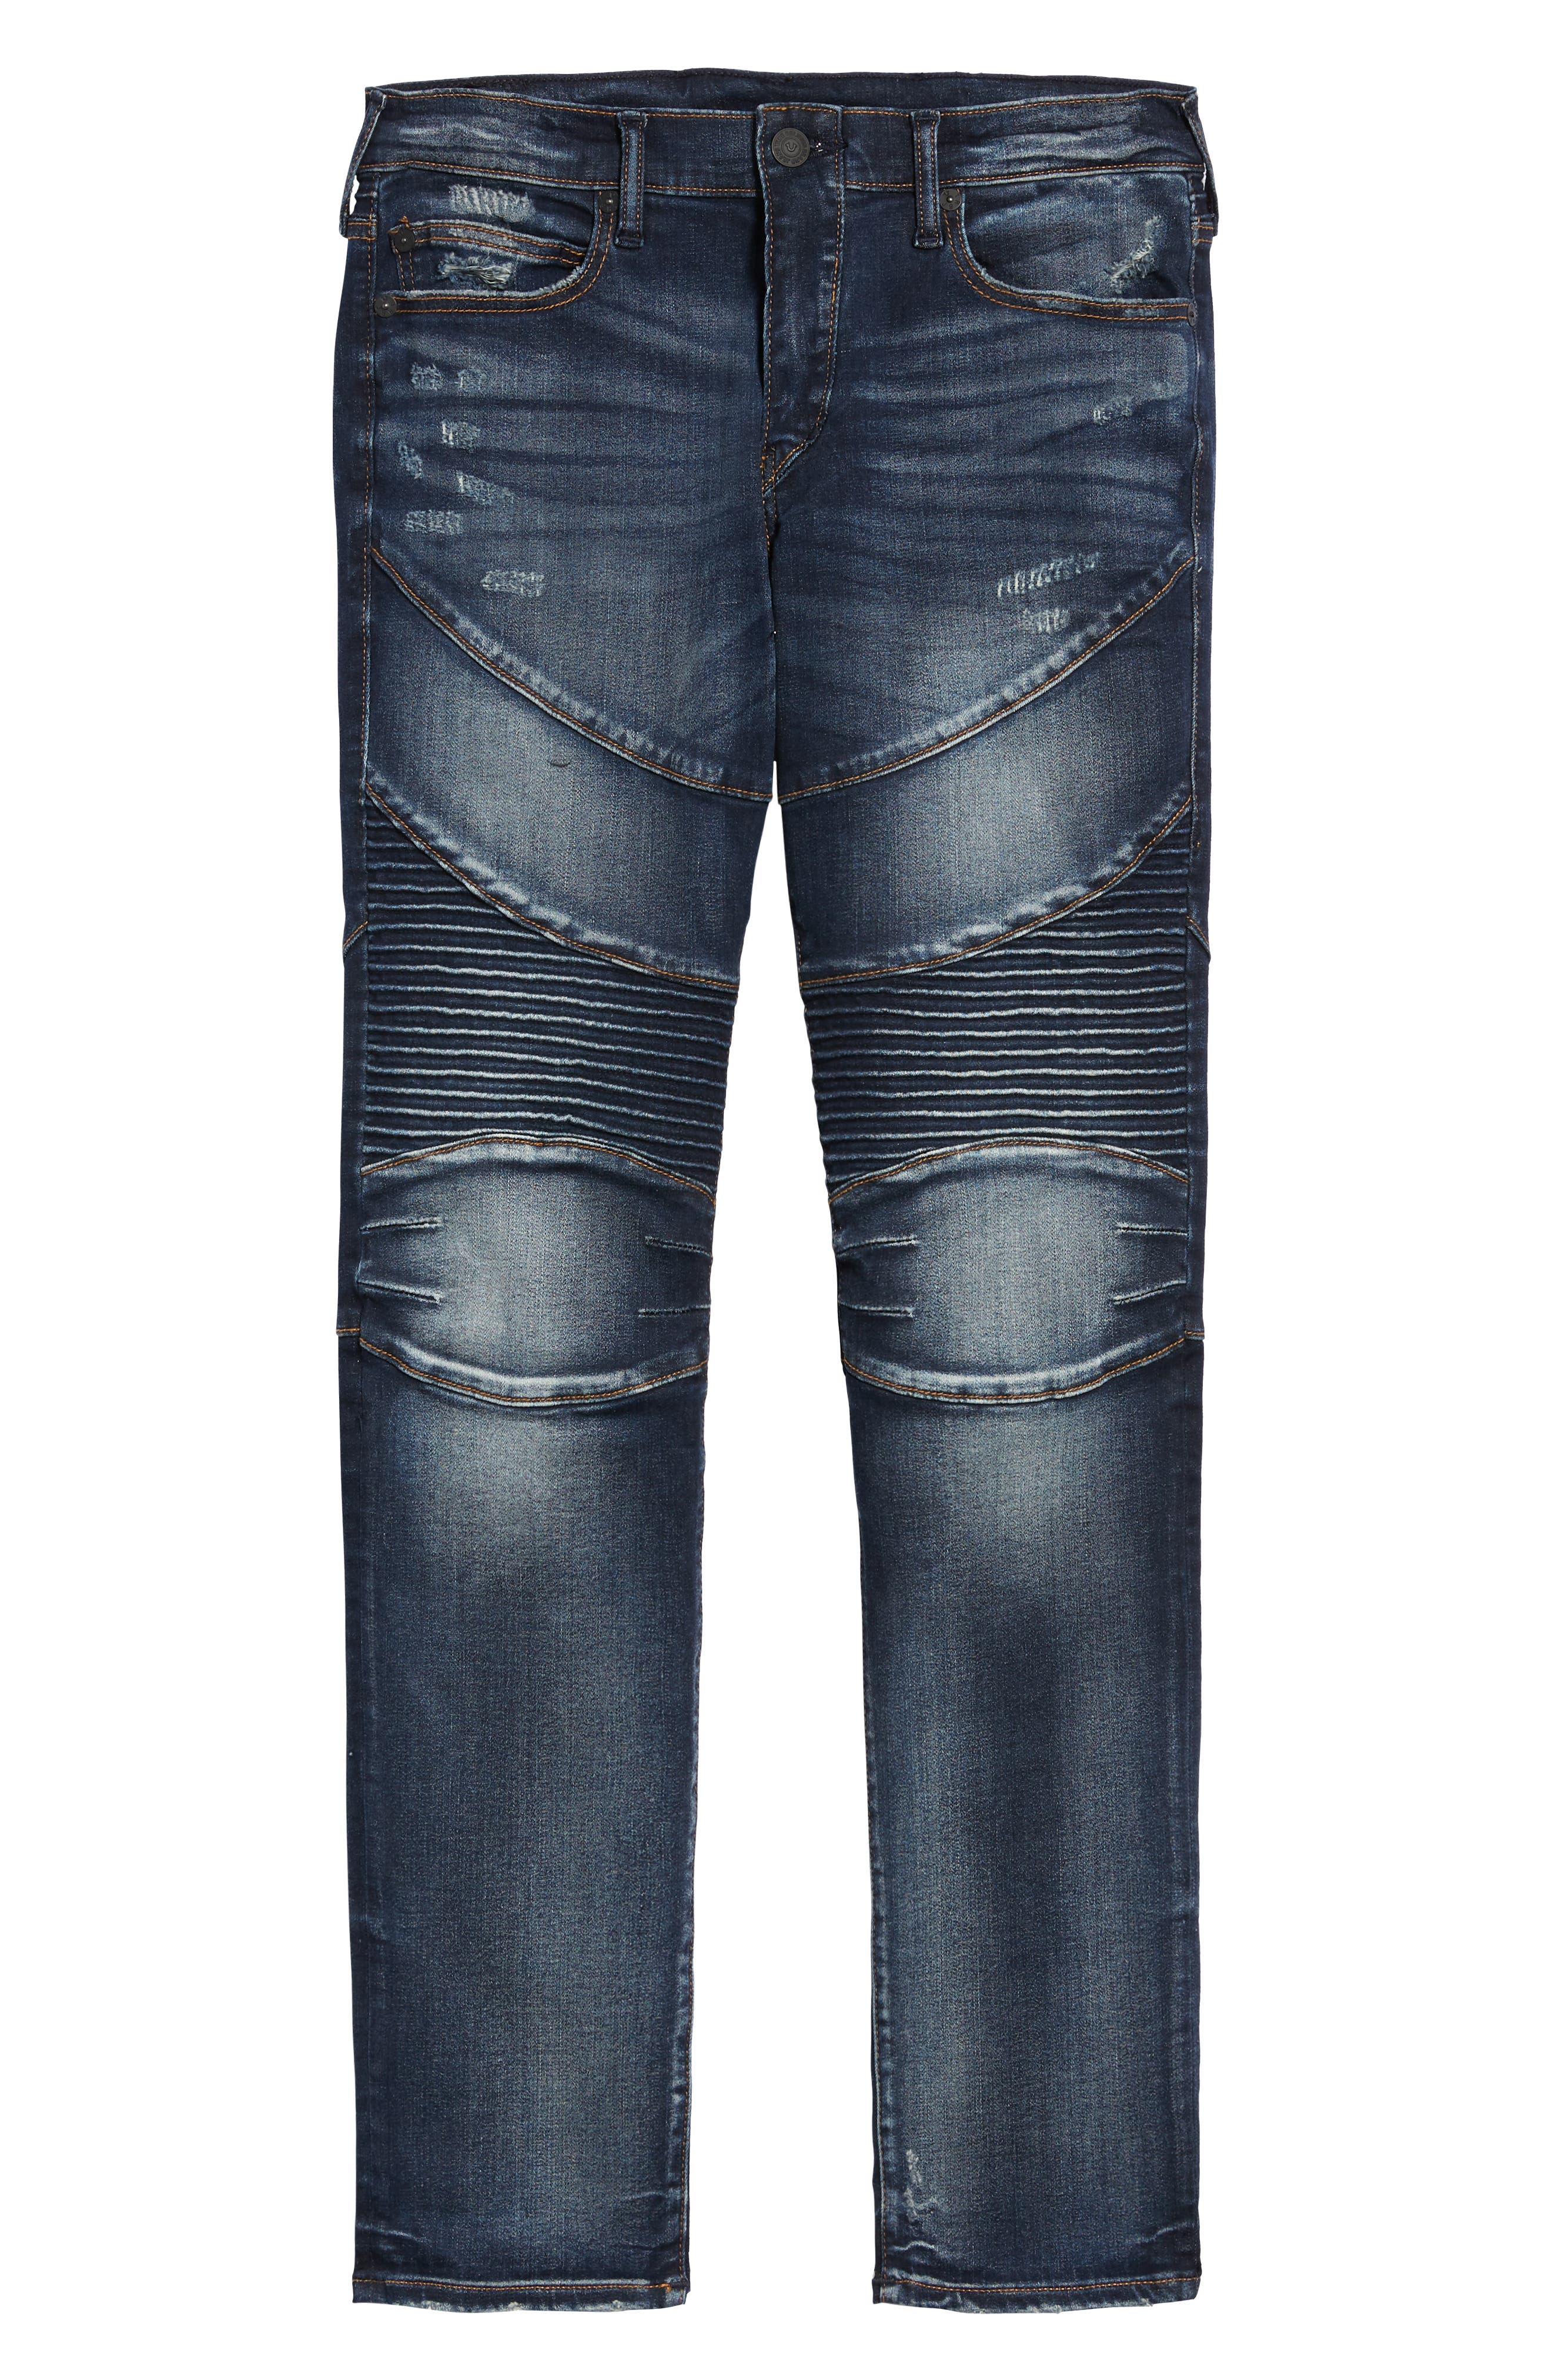 Rocco Skinny Fit Moto Jeans,                             Alternate thumbnail 6, color,                             MINERAL ASPHALT